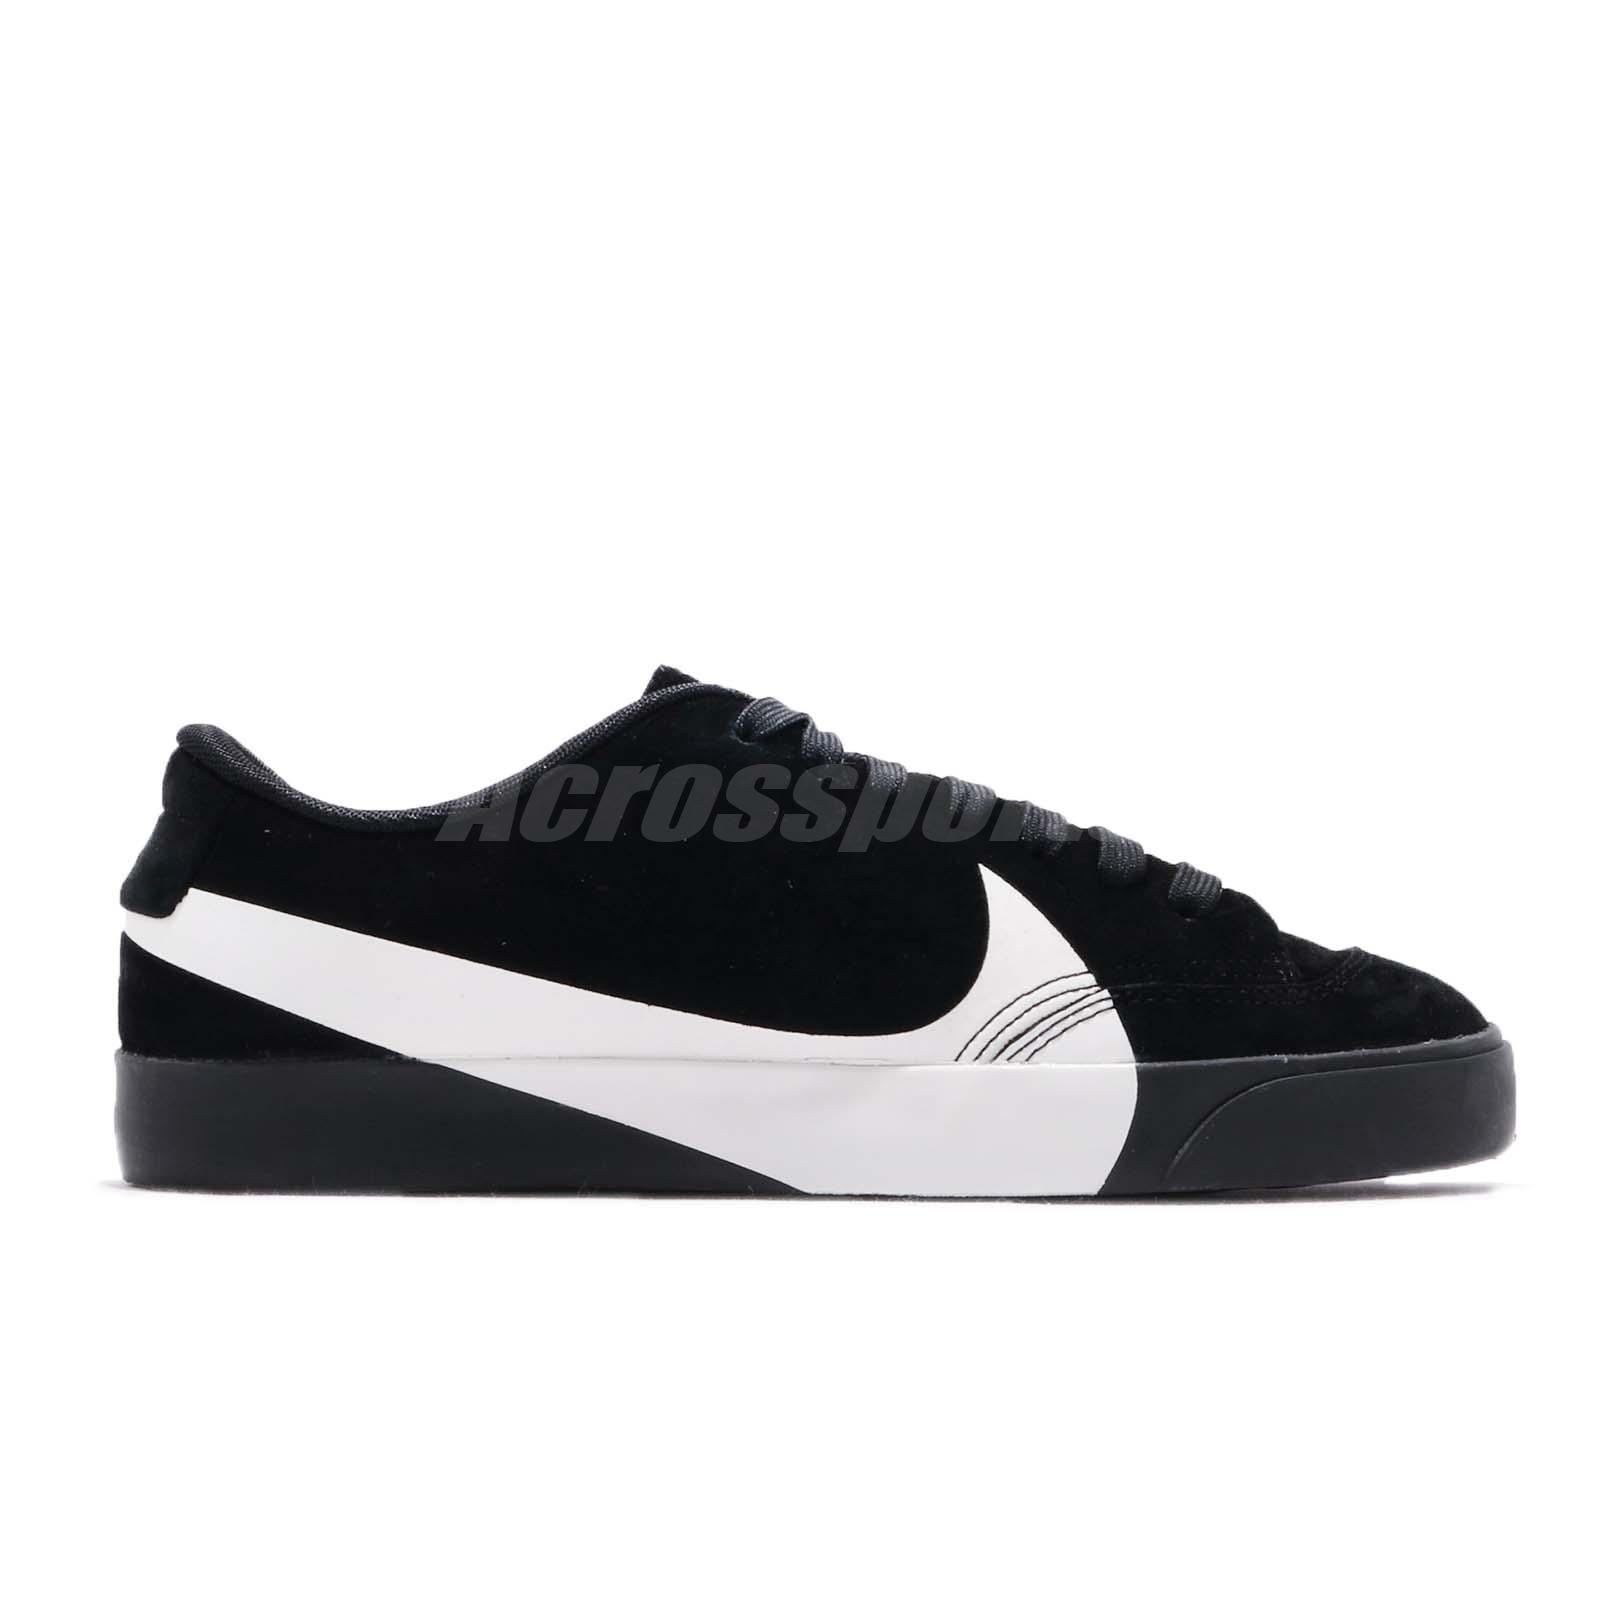 hot sale online c4990 62103 Details about Nike Wmns Blazer City Low LX Big Logo Swoosh Black White  Women Shoes AV2253-001